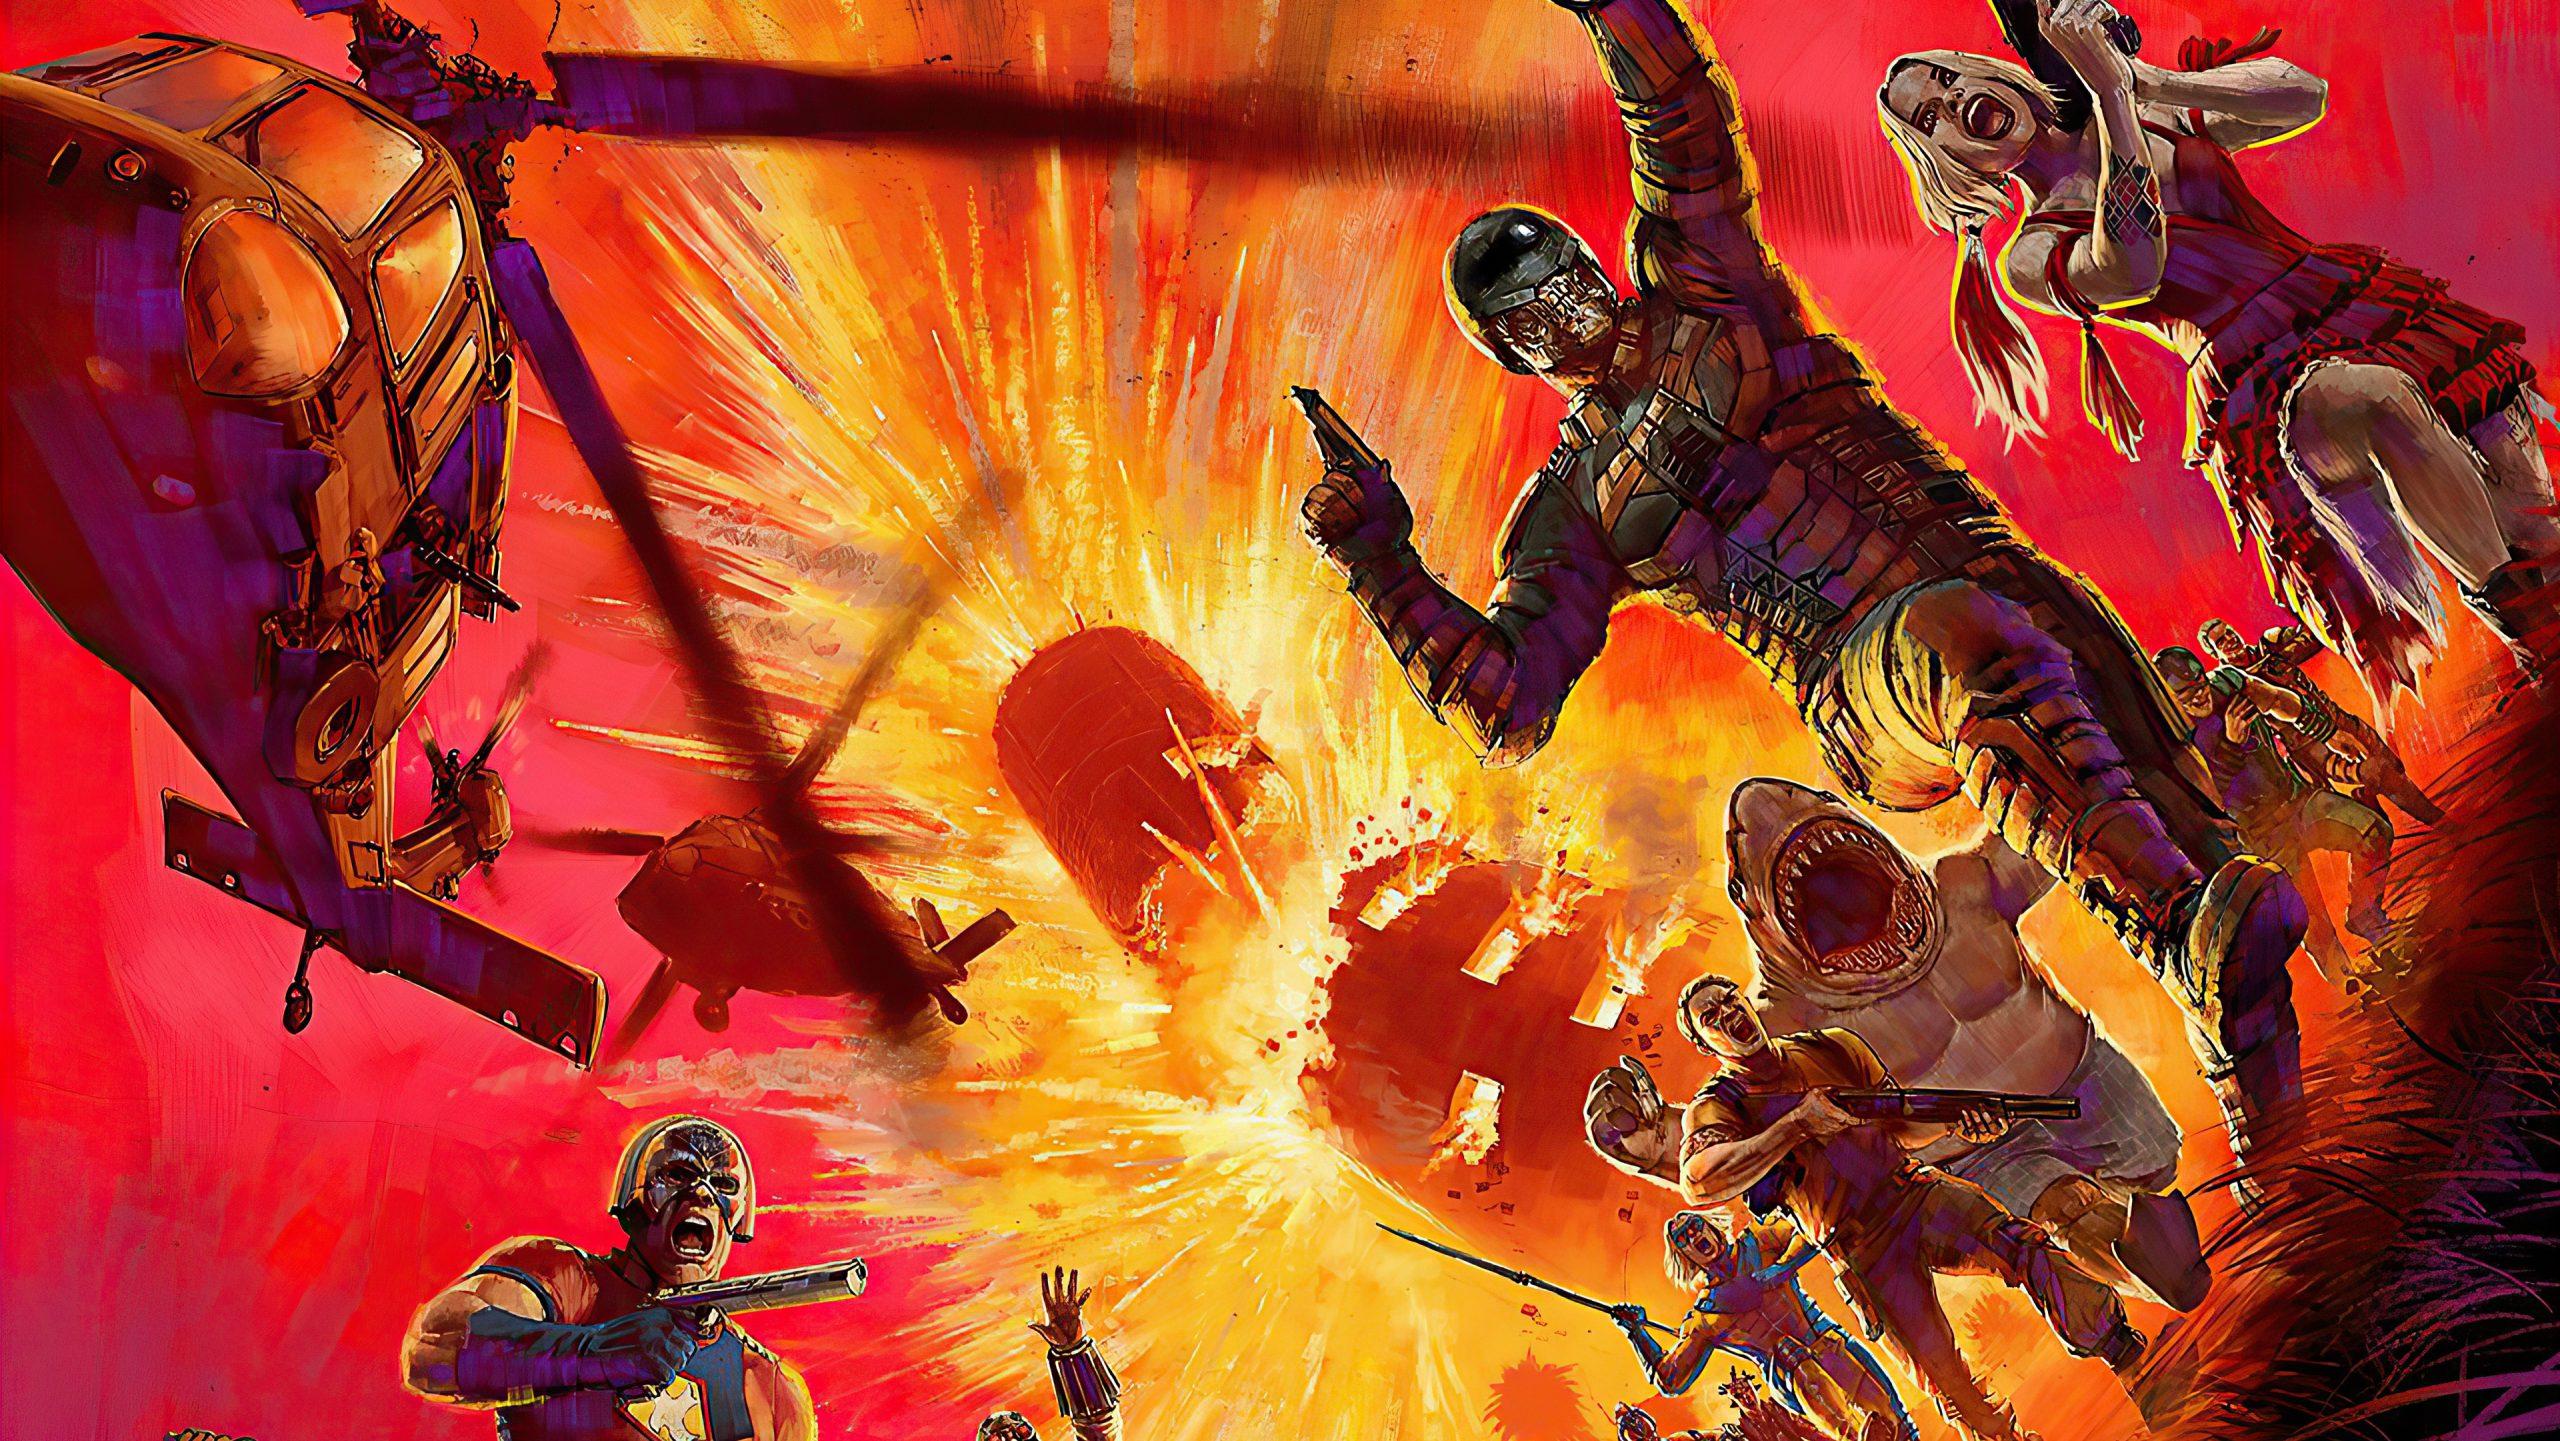 DC production, The Suicide Squad 2021 release